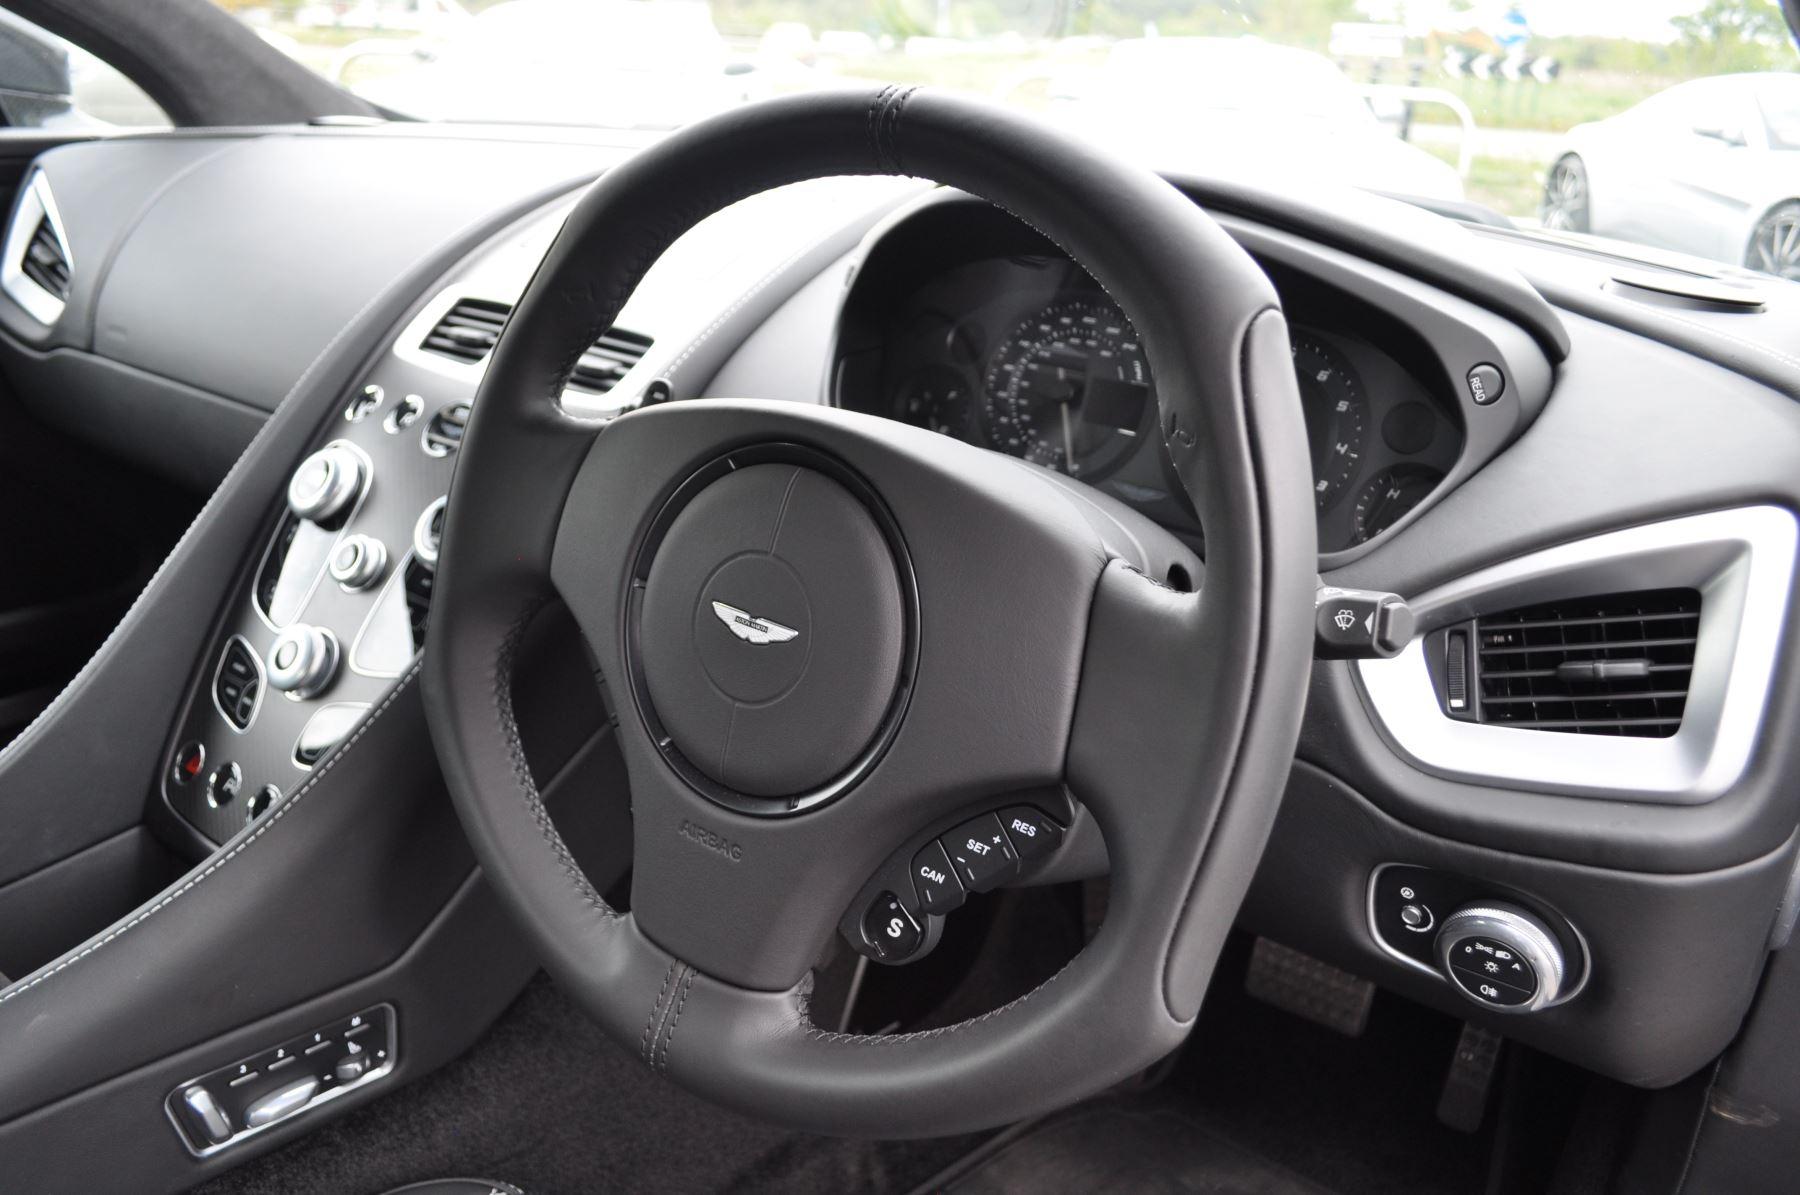 Aston Martin Vanquish S V12 [595] S 2+2 2dr Touchtronic image 26